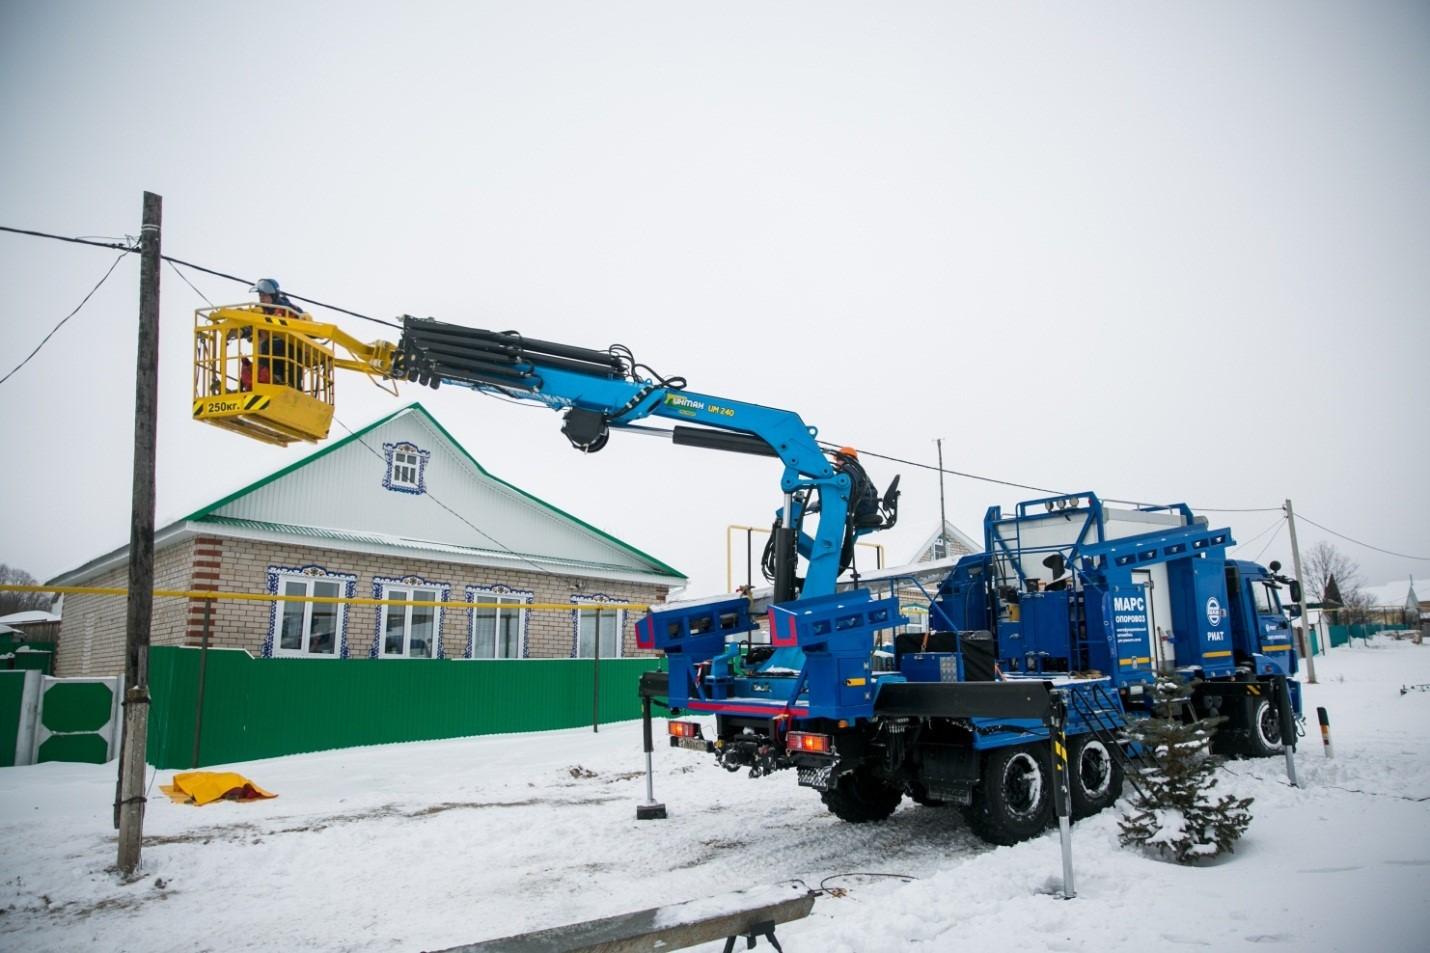 ОАО РИАТ на выставке «Стройиндустрия Севера. Энергетика. ЖКХ`2018»